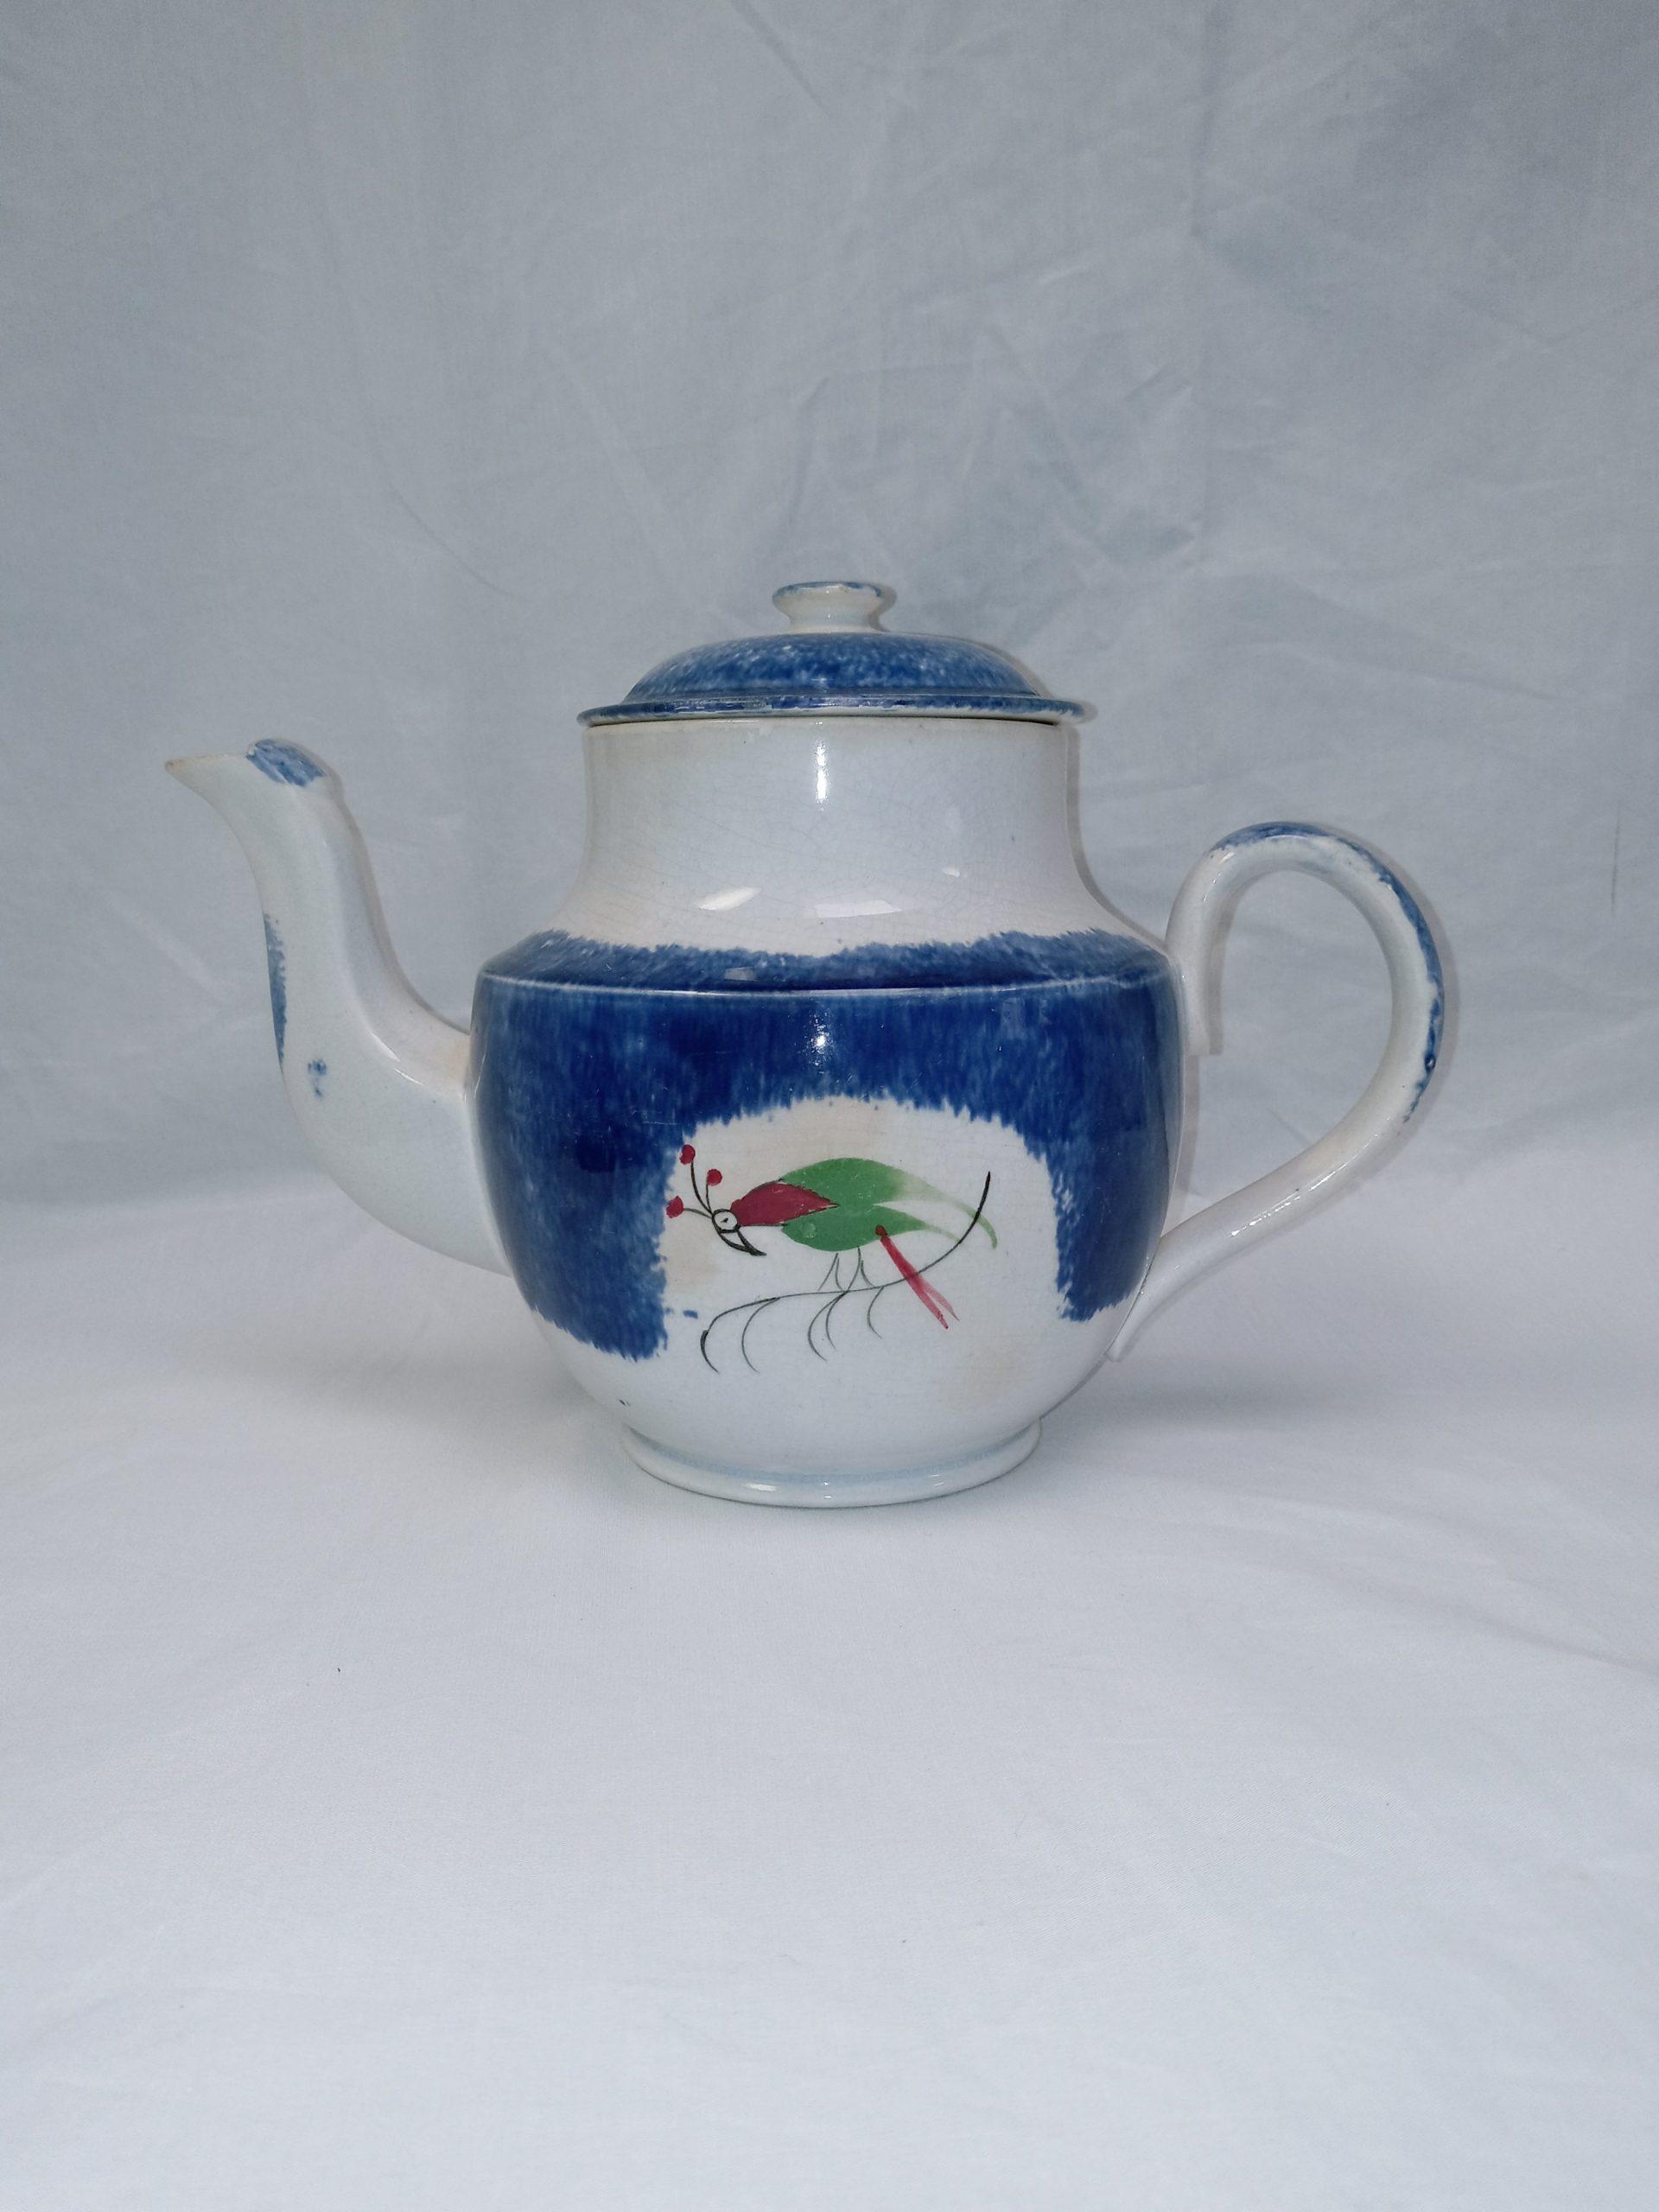 200-36847 Blue Spatter Tea Pot Image